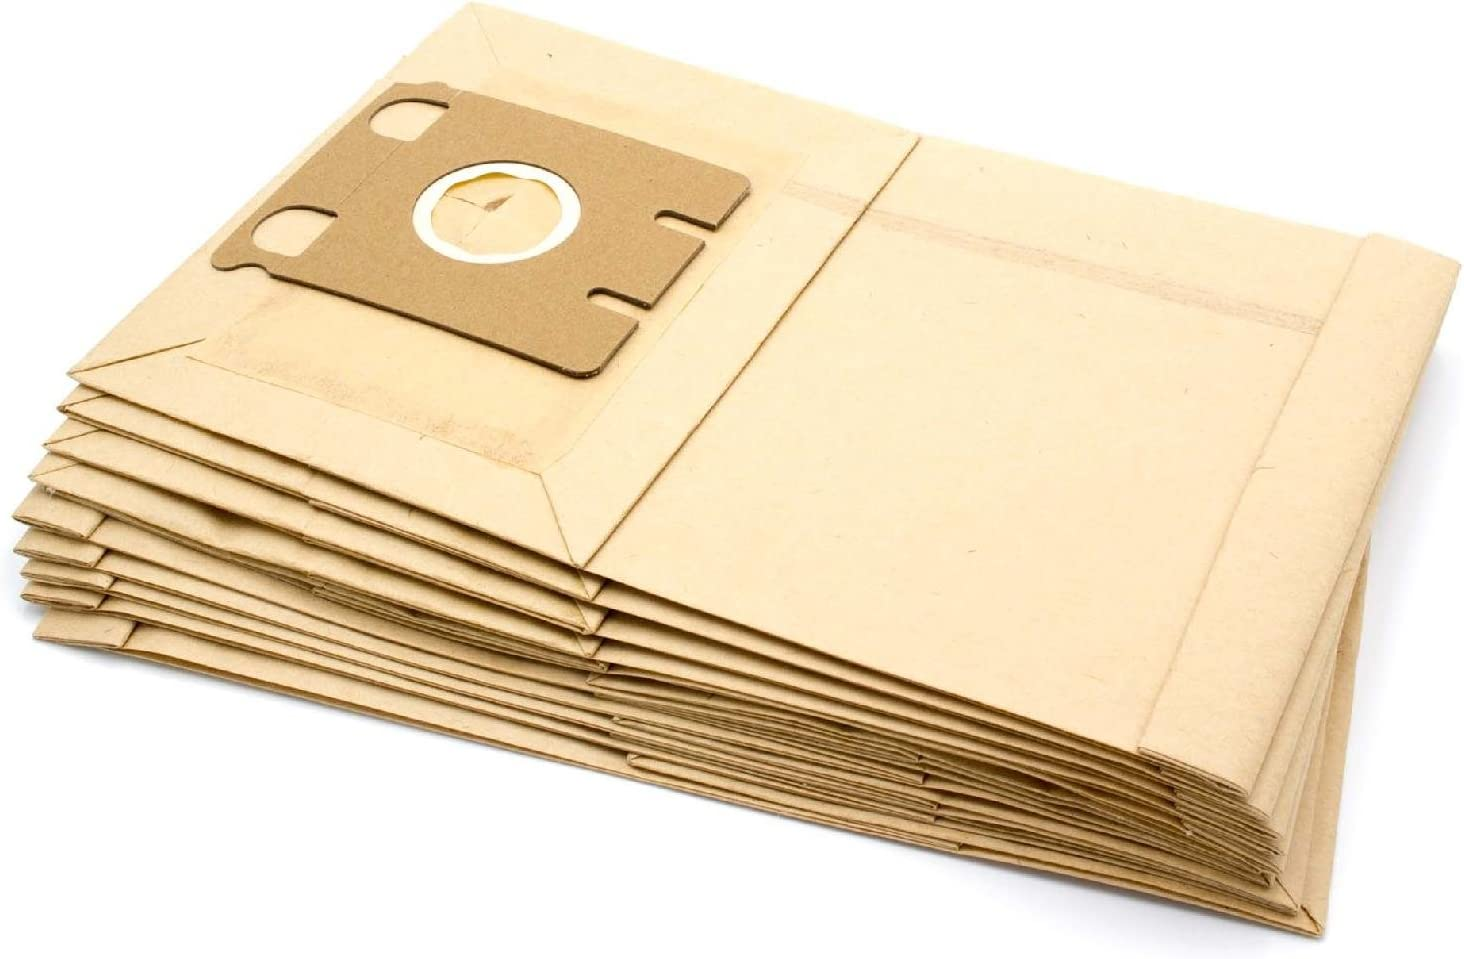 vhbw 10 Papier Staubsaugerbeutel Filtertüten passend für Staubsauger Saugroboter Miele S217, S218, S219, S220, S221, S222, S223, S224, S225, S226